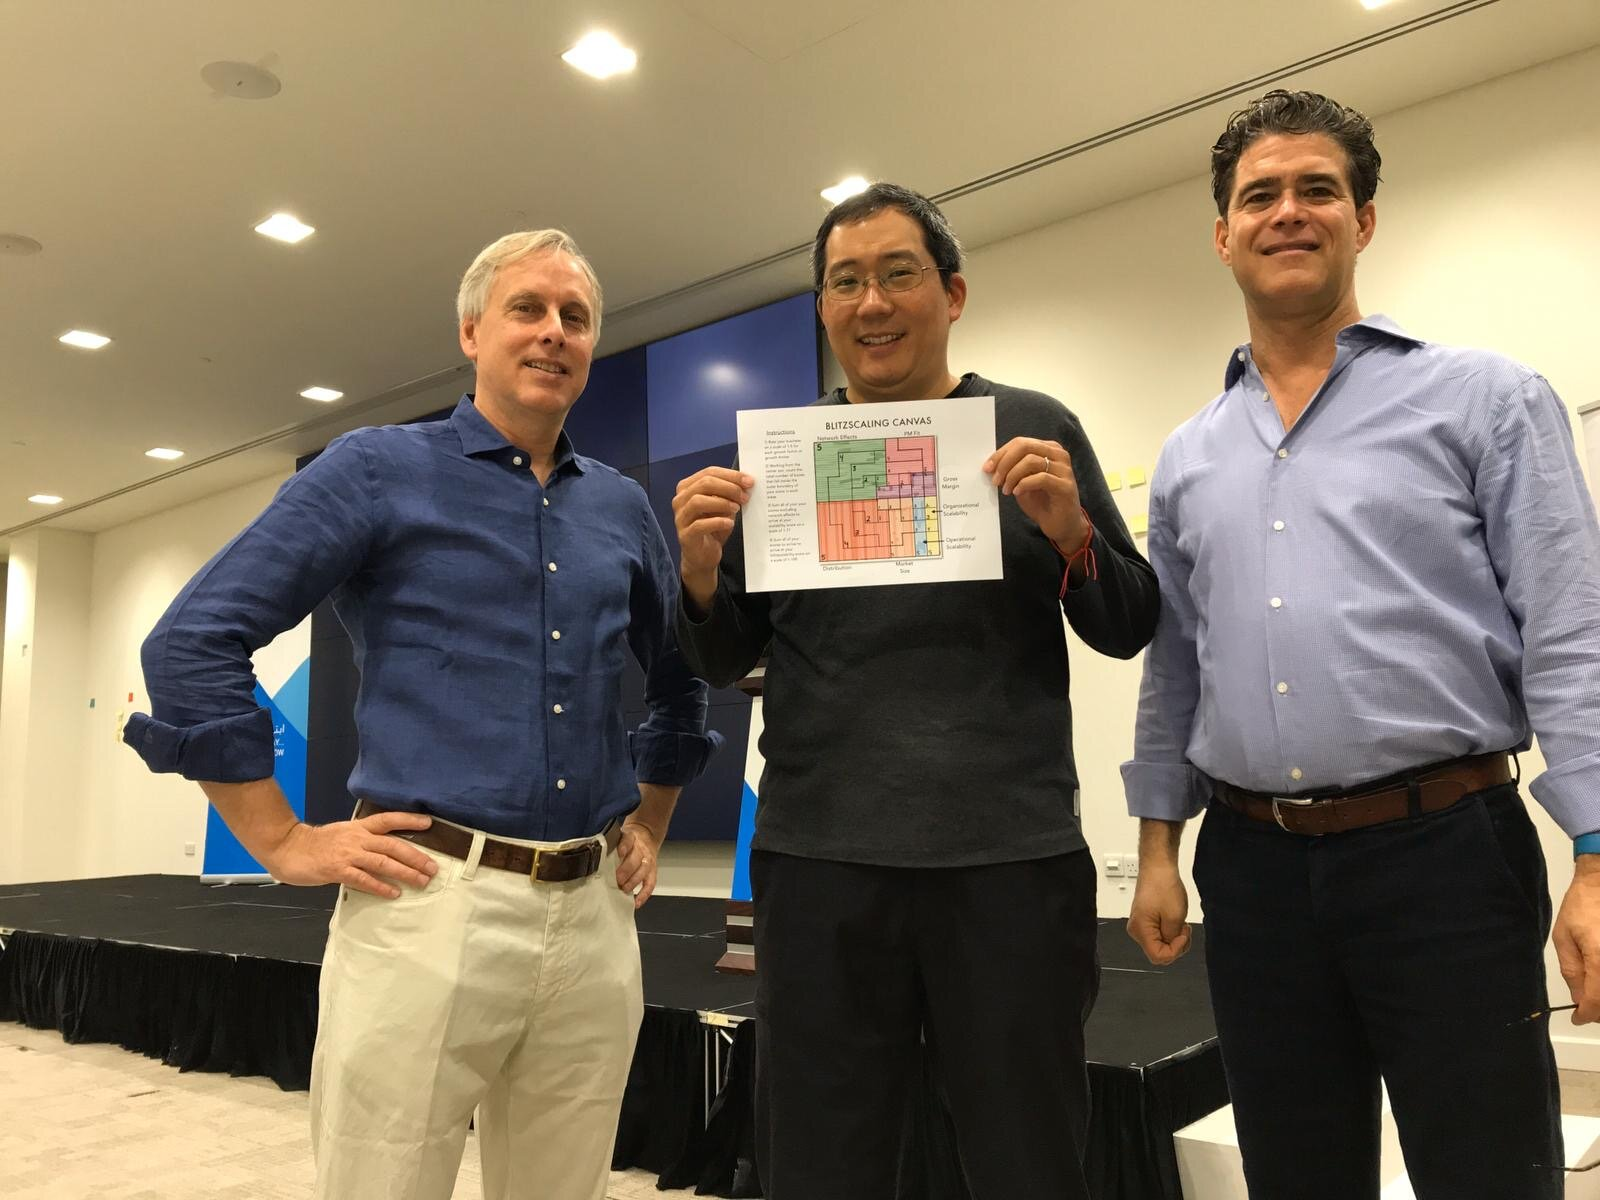 Global Blitz Scale Mentors: Scott Johnson, Chris Yeh, Jeffrey Abbot